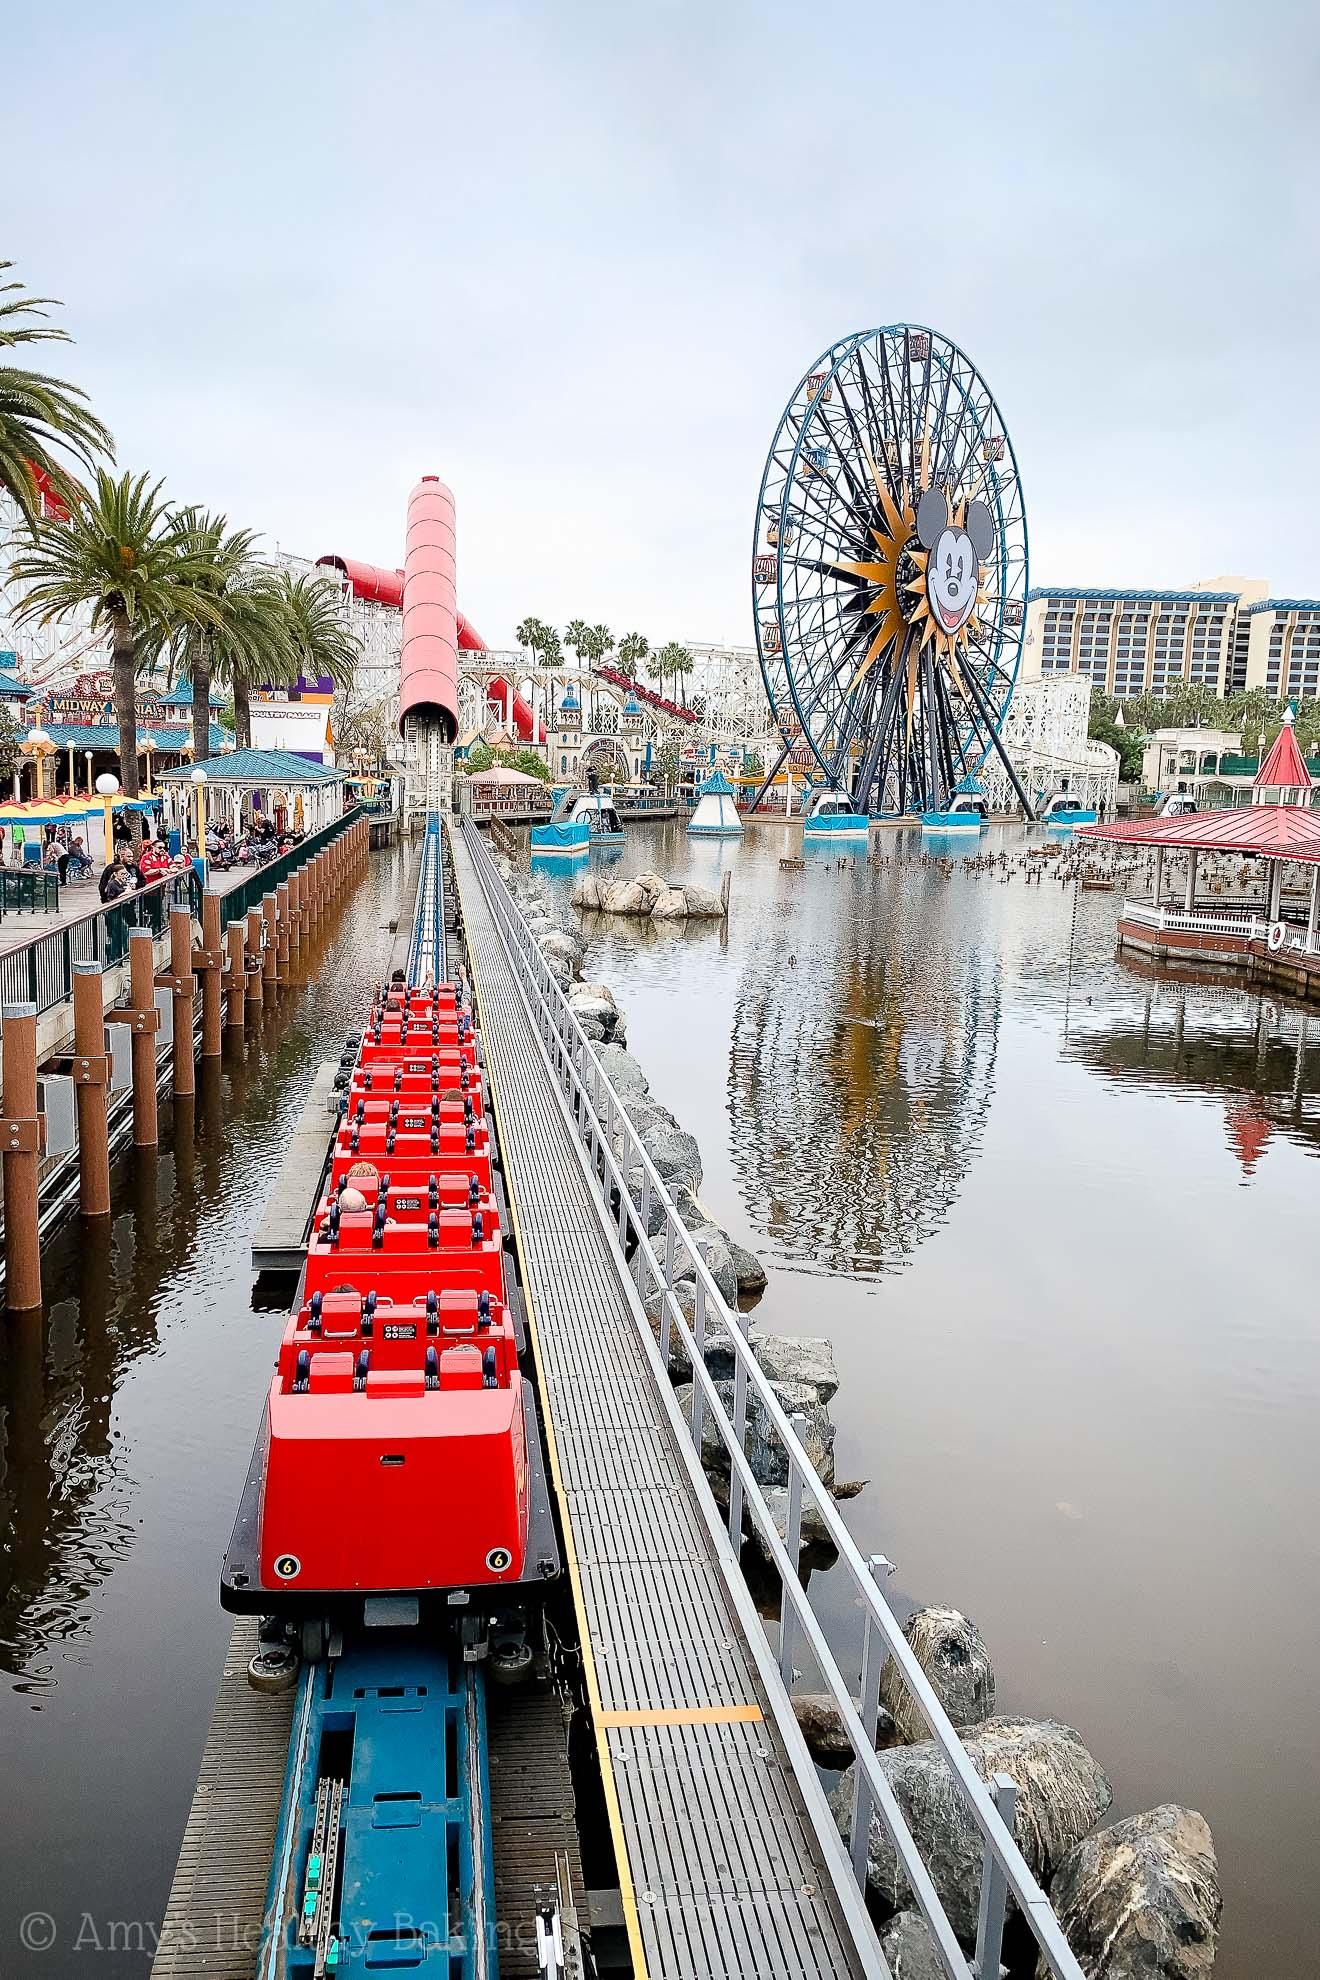 The starting launch of the Incredi-coaster in California Adventure - Anaheim